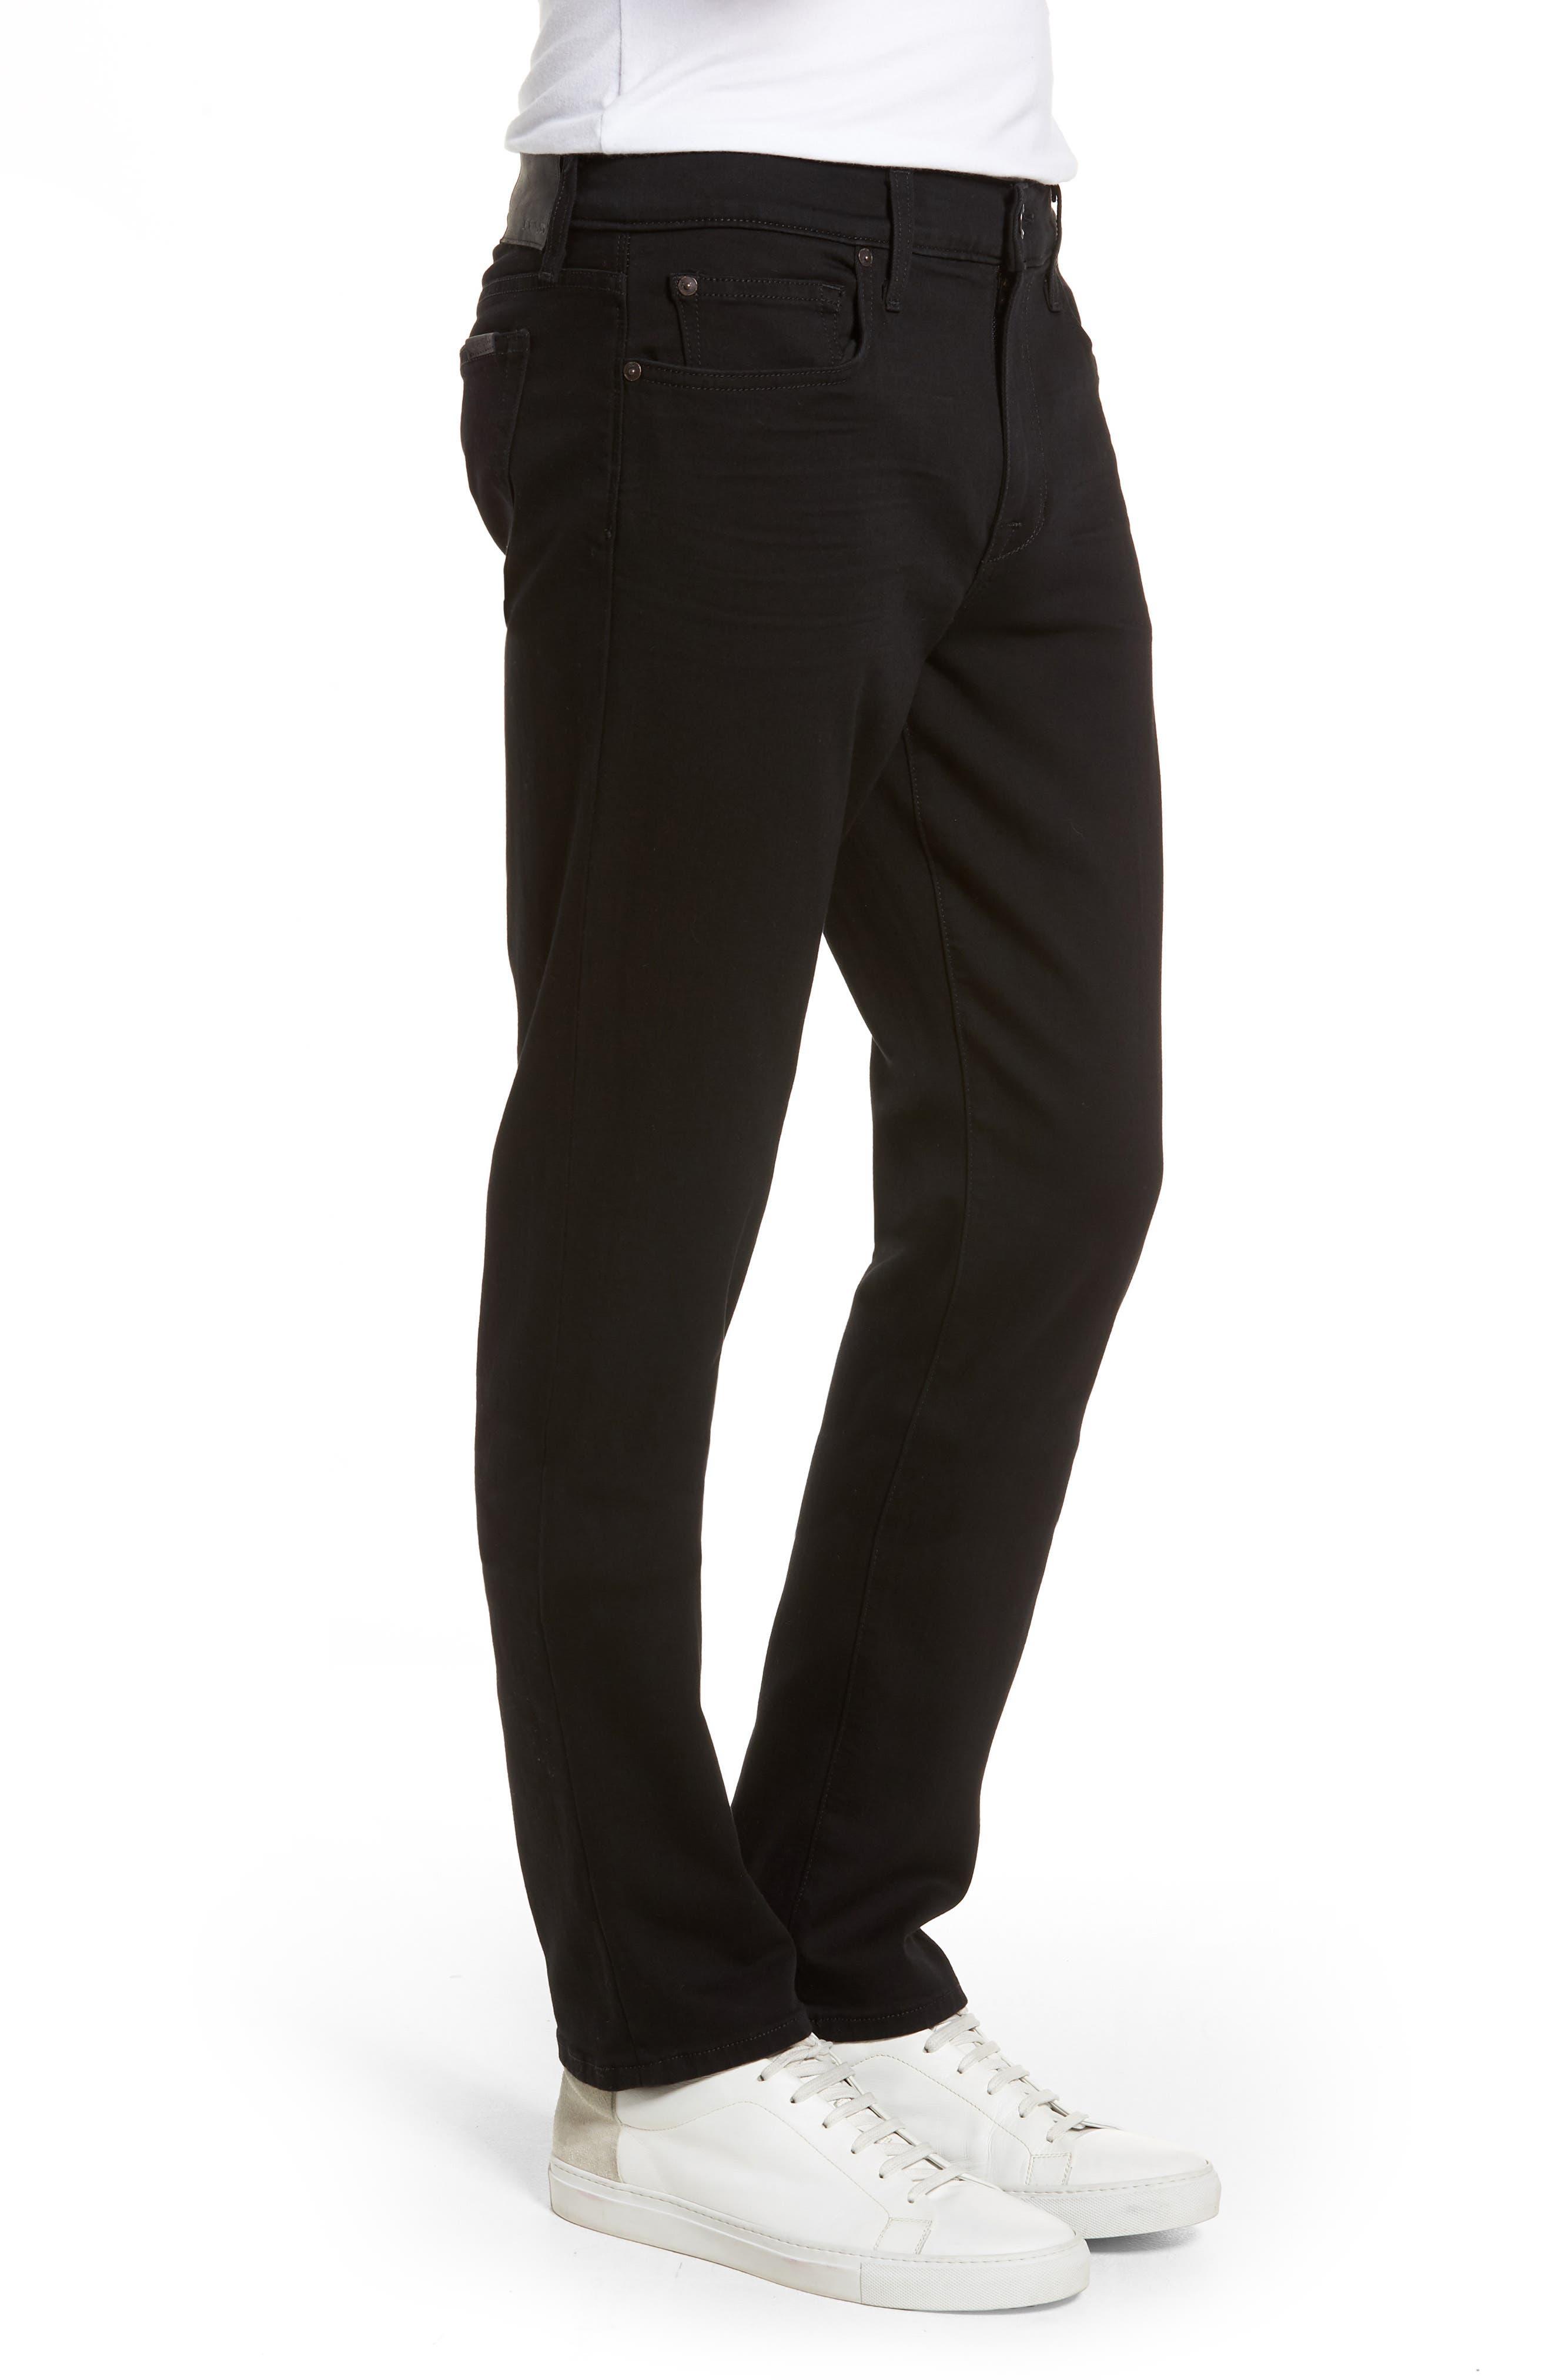 Brixton Slim Straight Fit Jeans,                             Alternate thumbnail 3, color,                             Abraham